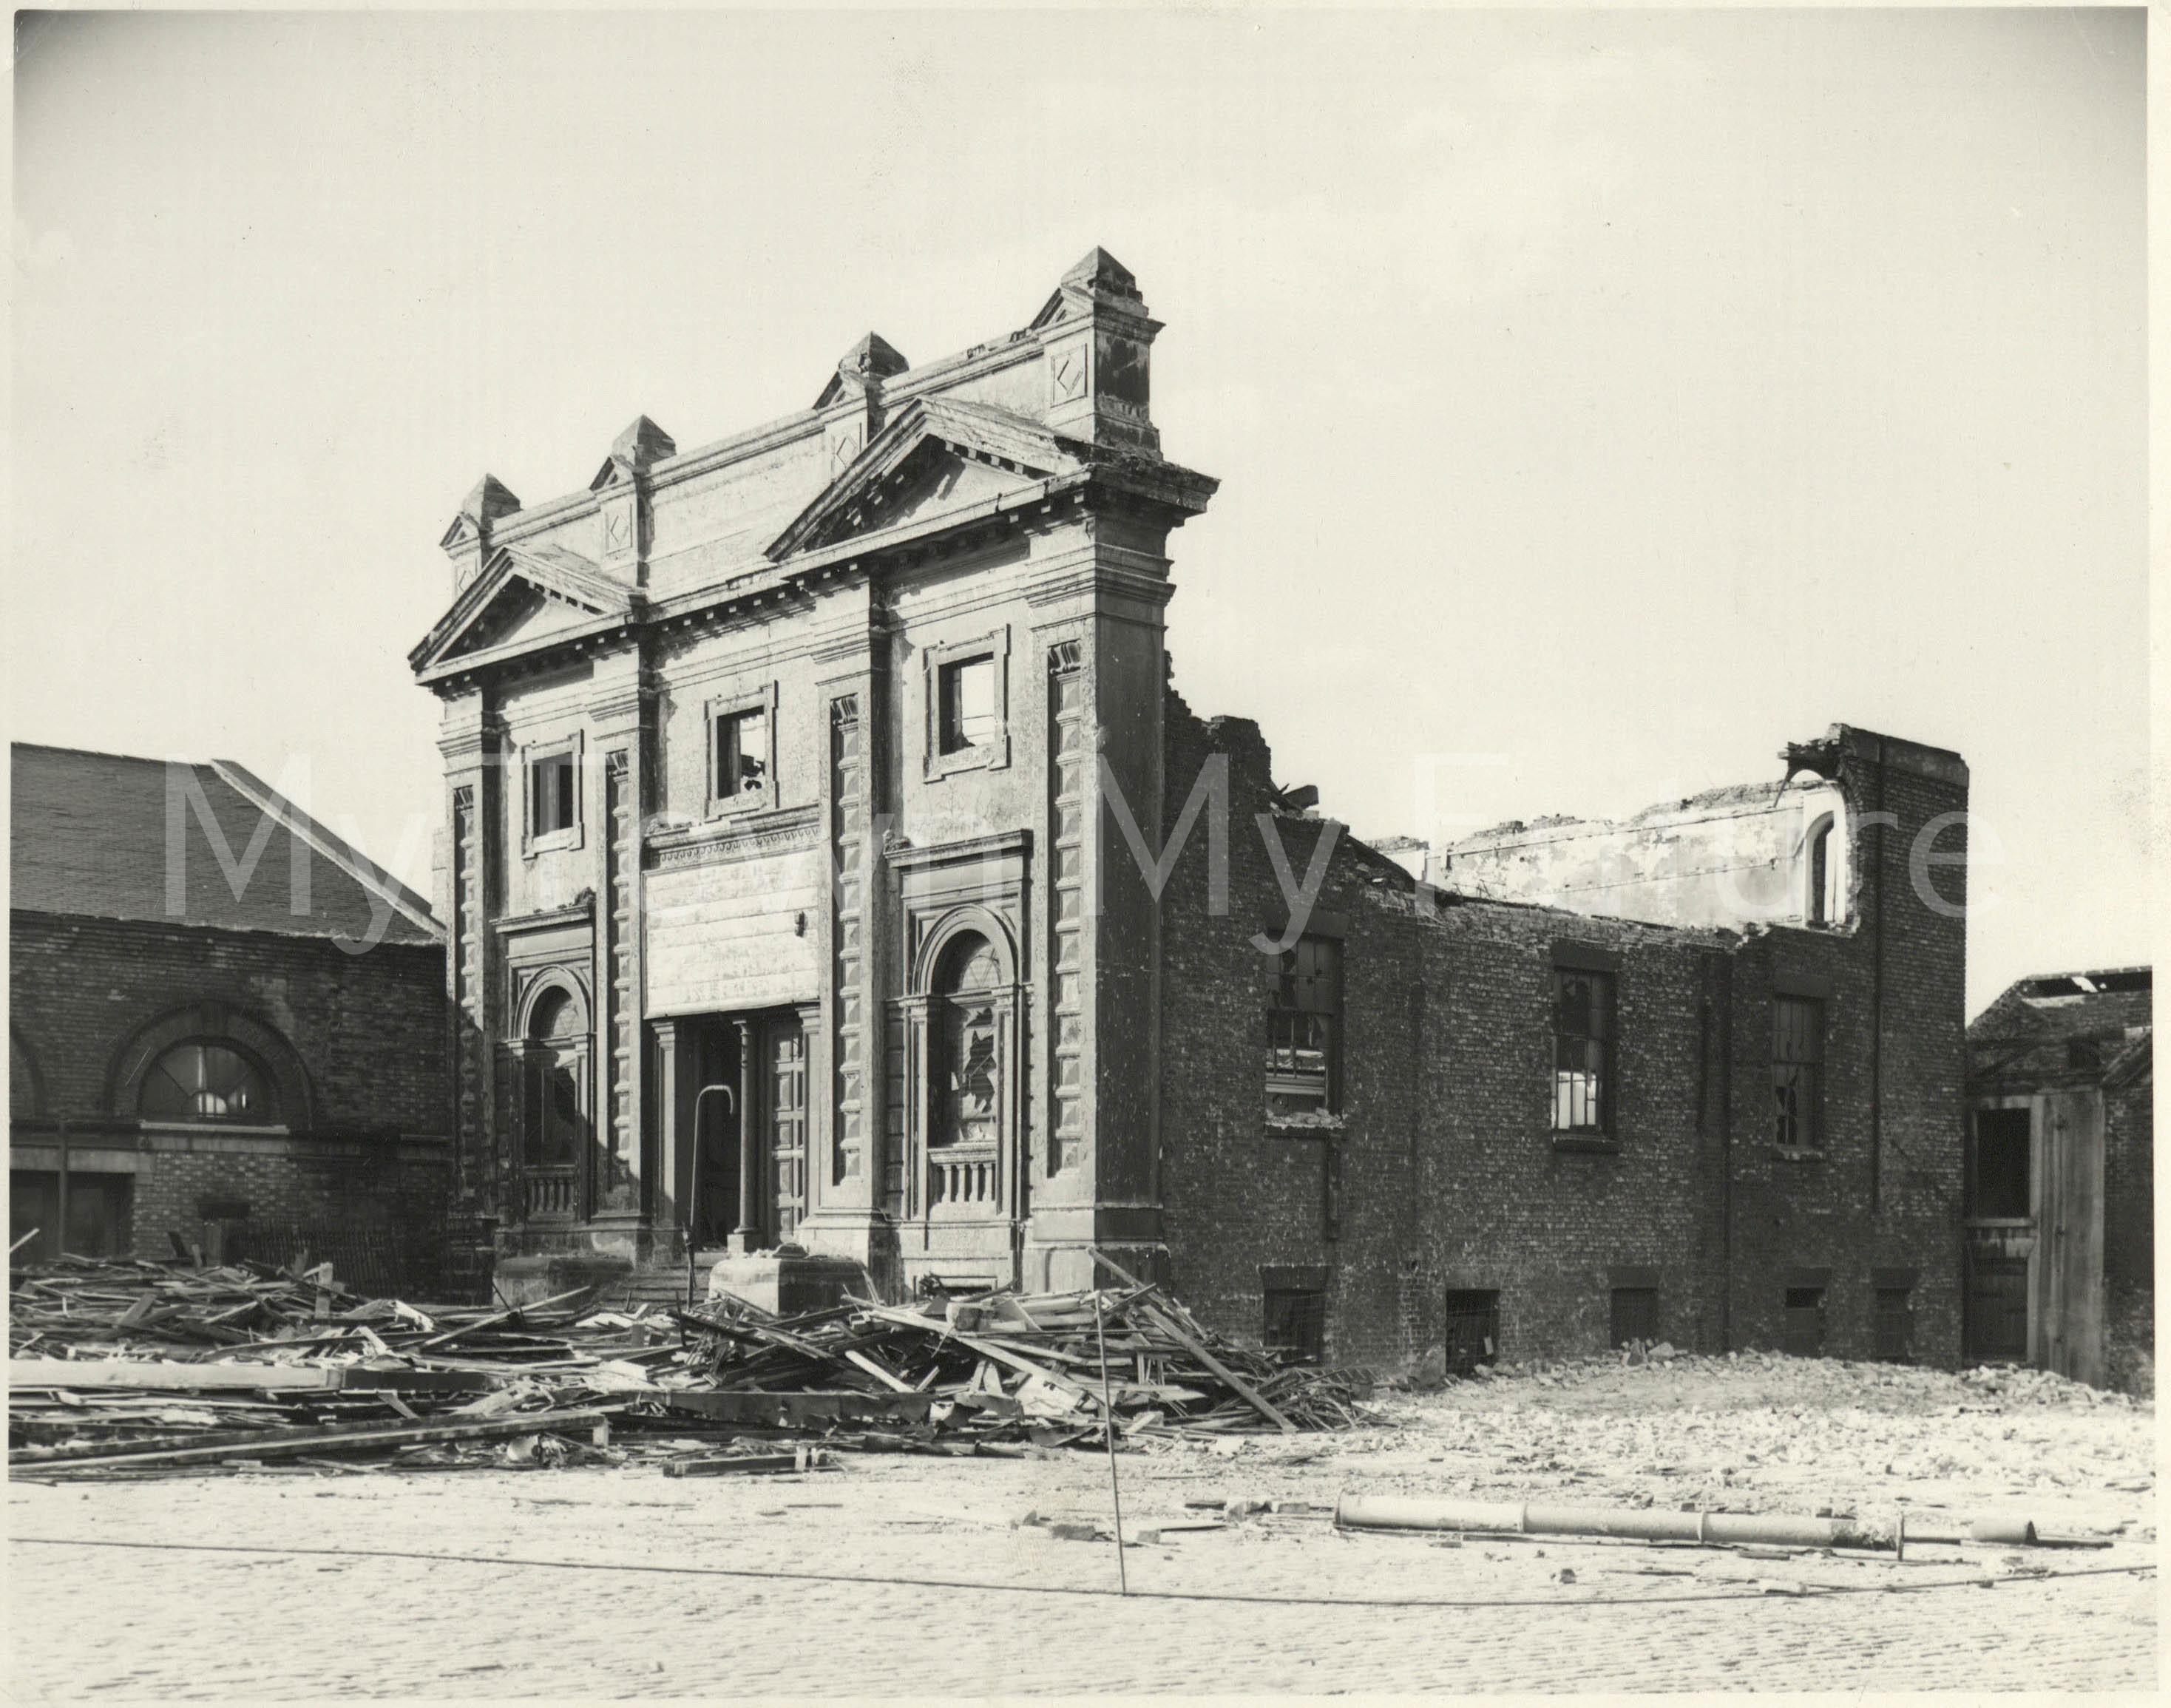 Centenary Methodist Church, 1959, Borough Engineers Department